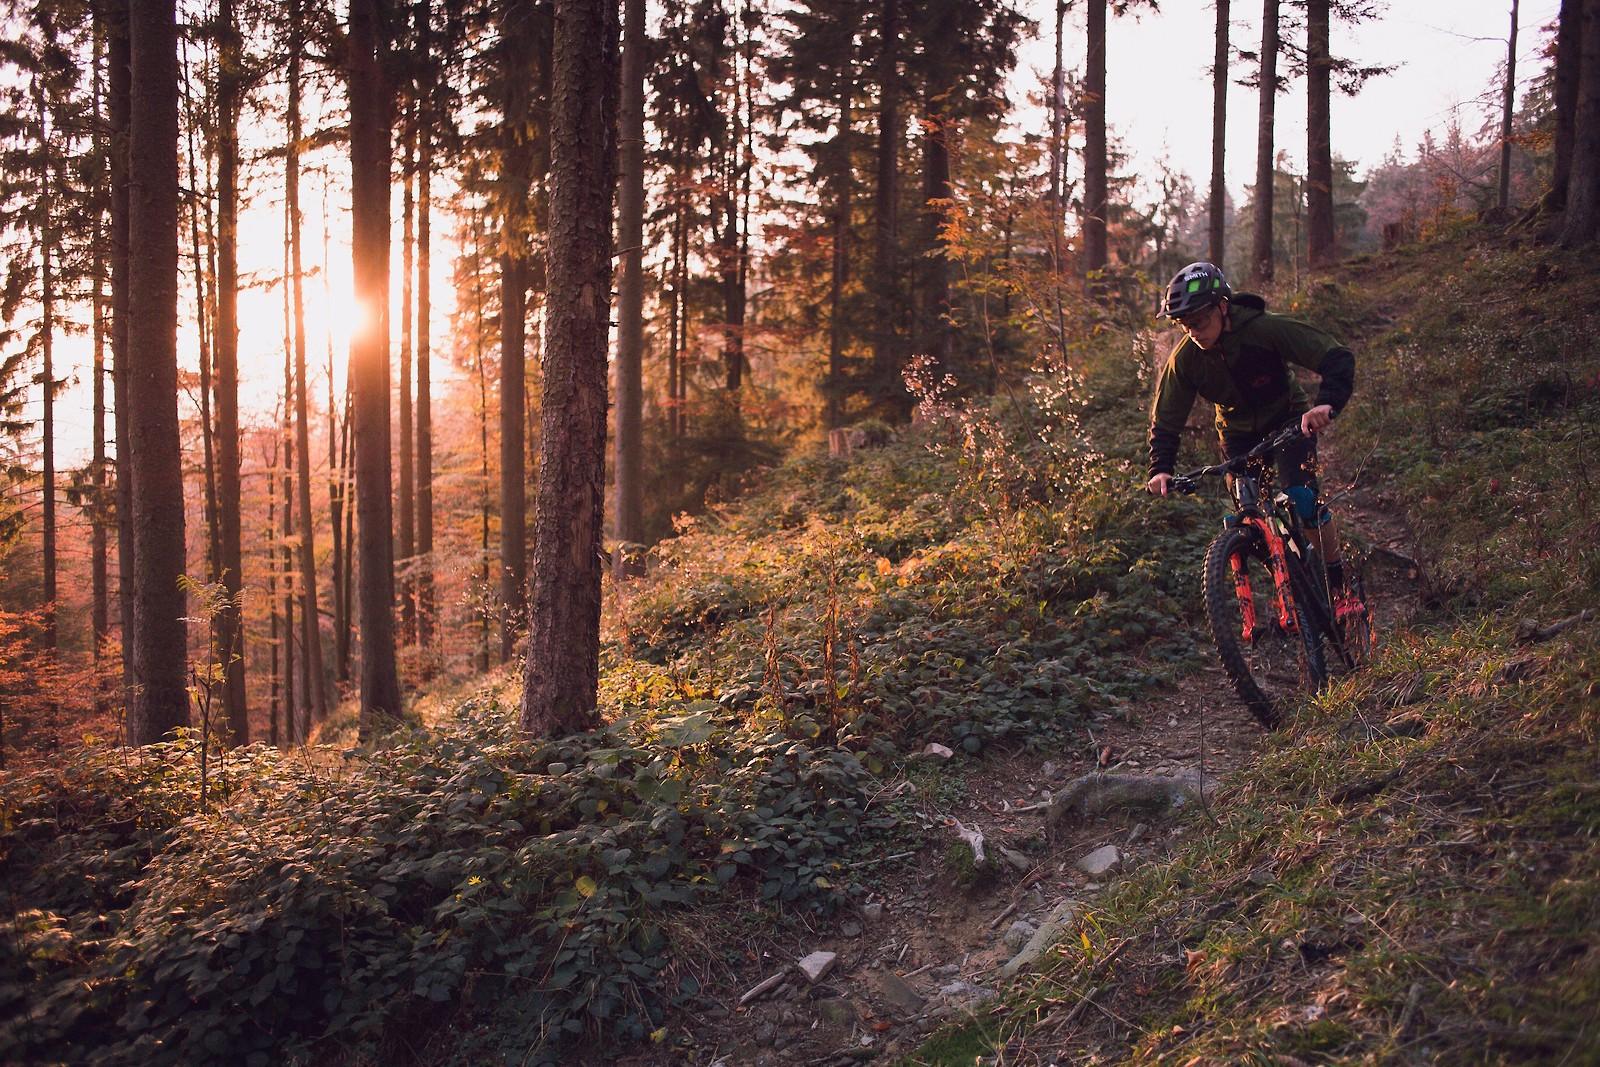 Autumn mornings - johnseehu - Mountain Biking Pictures - Vital MTB